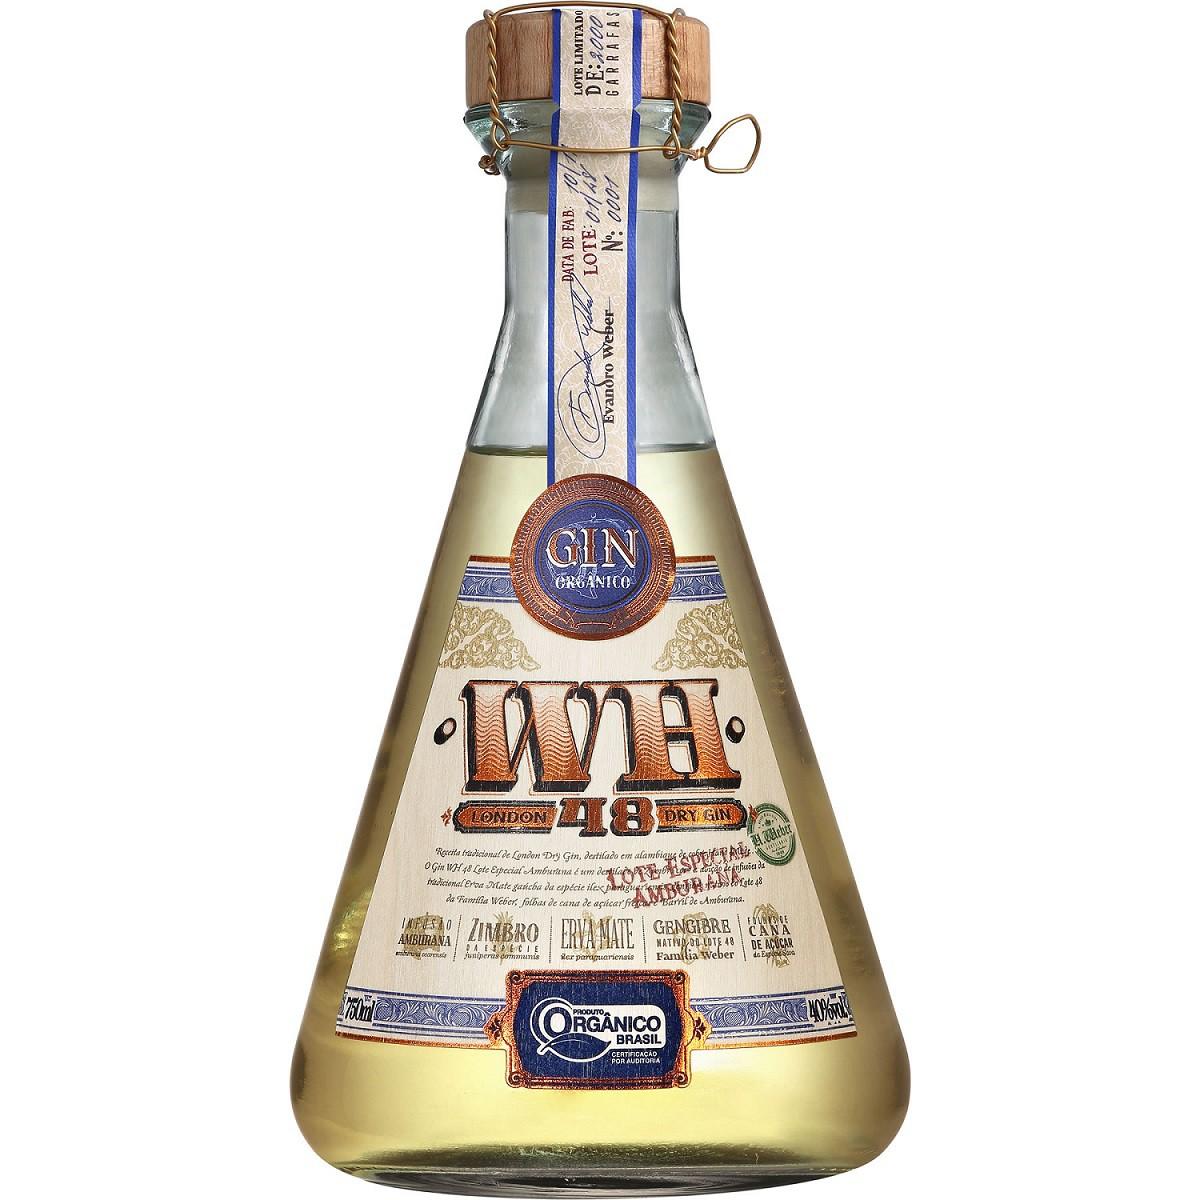 London Dry Gin WH48 (lote amburana) - 750ml